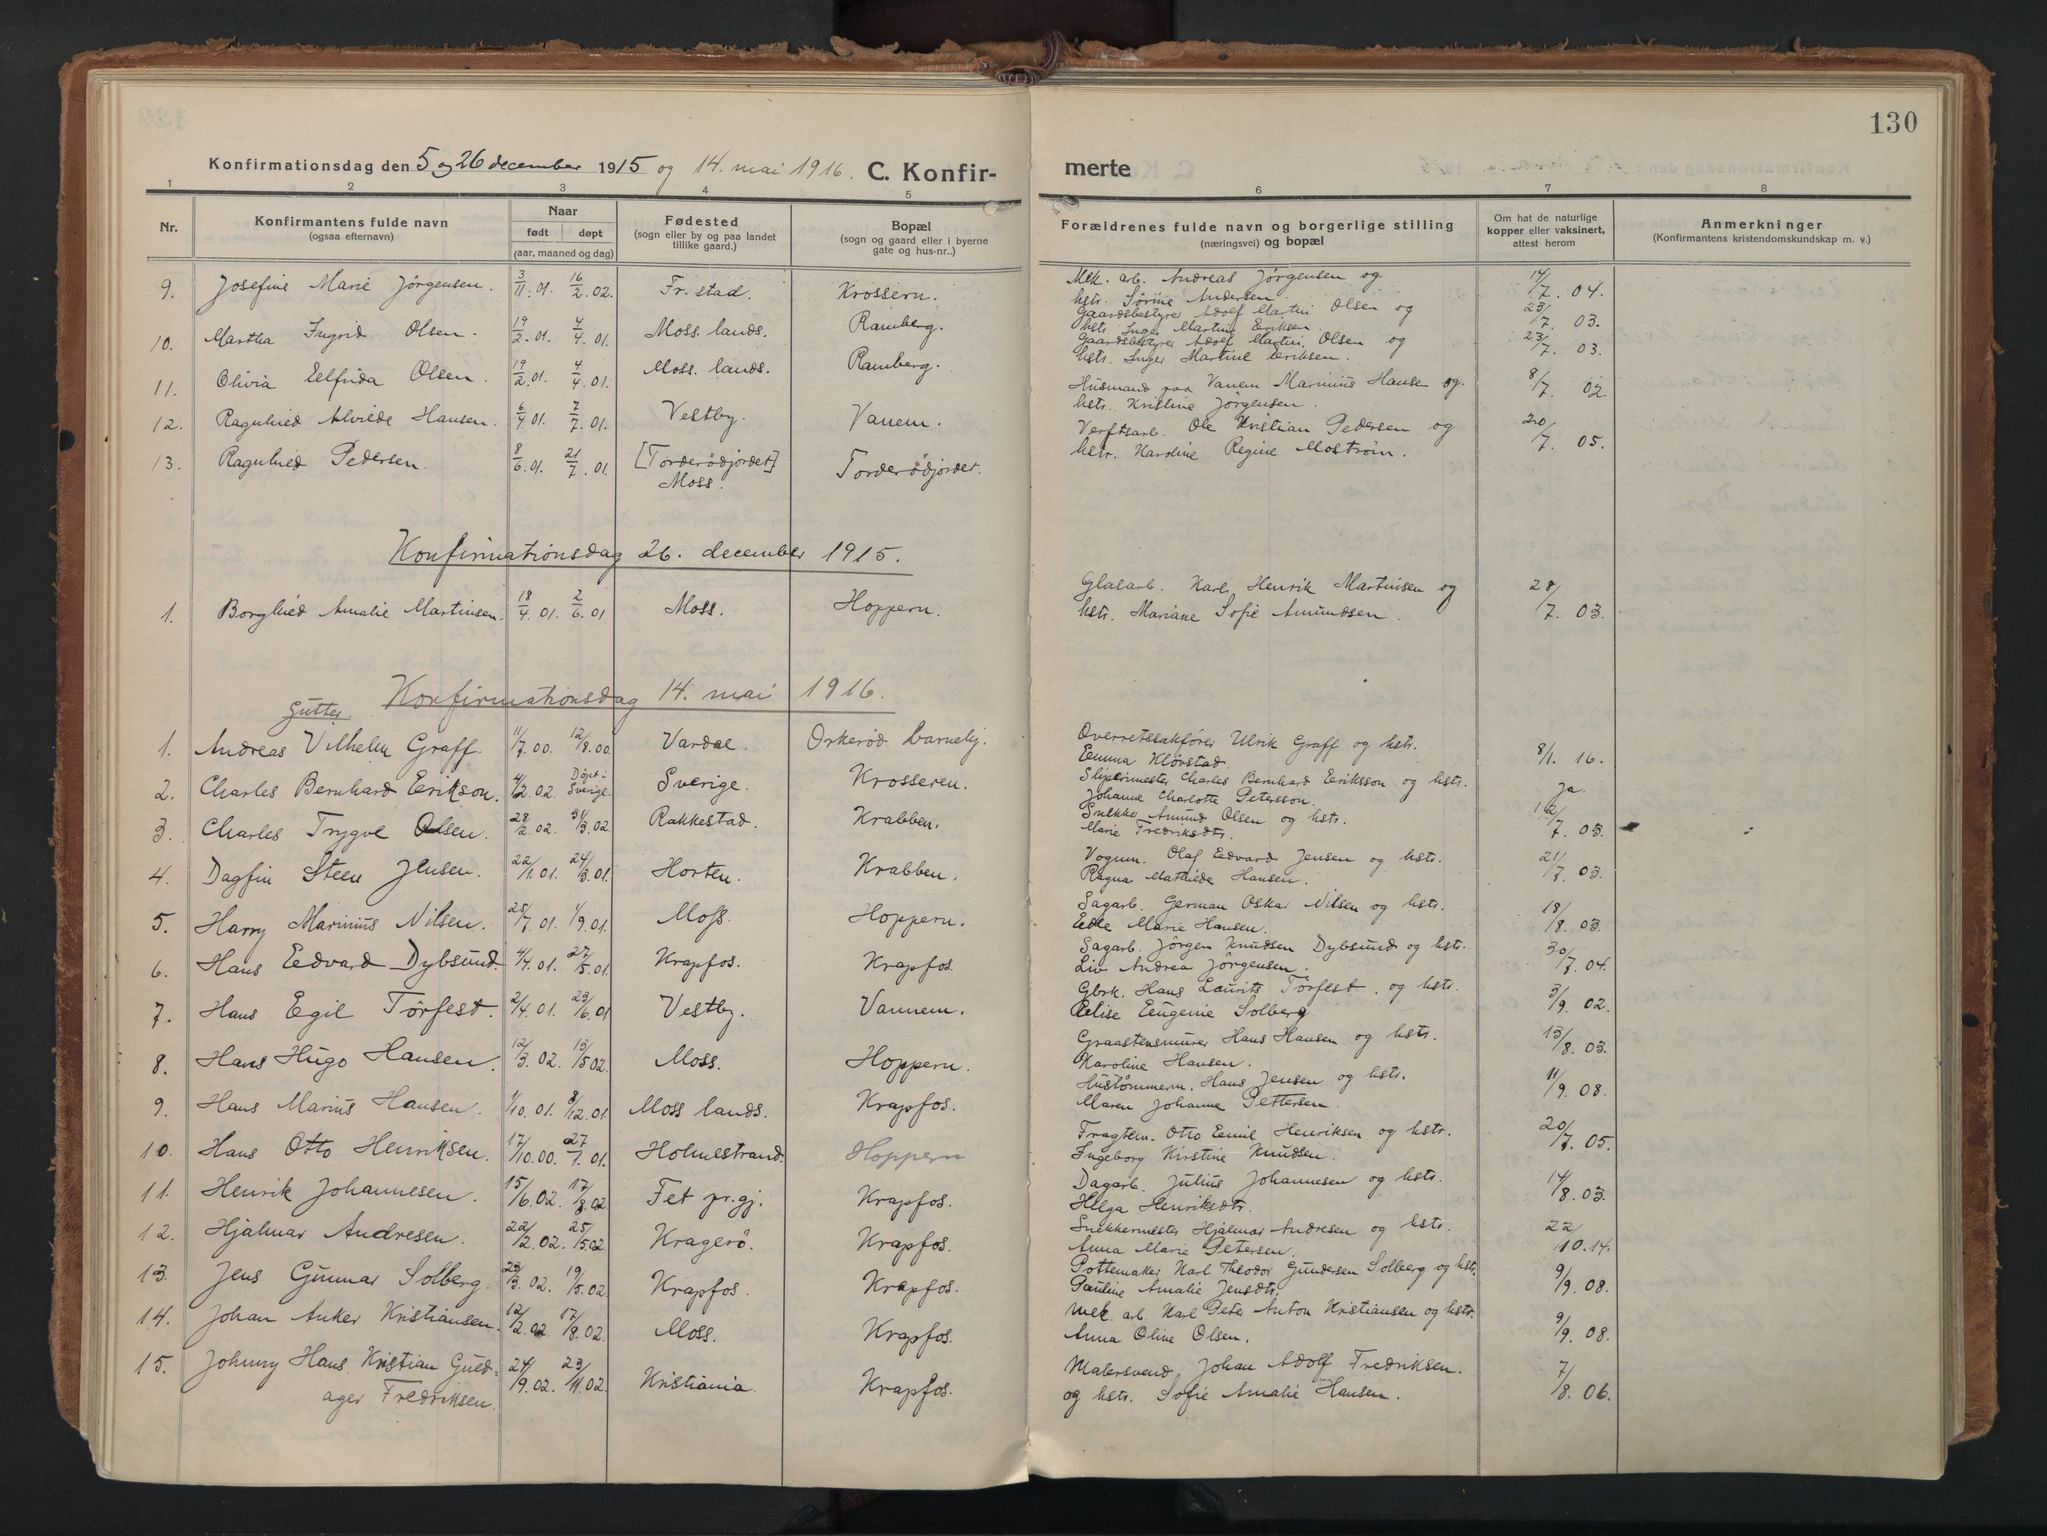 SAO, Moss prestekontor Kirkebøker, F/Fc/Fac/L0004: Ministerialbok nr. III 4, 1915-1929, s. 130